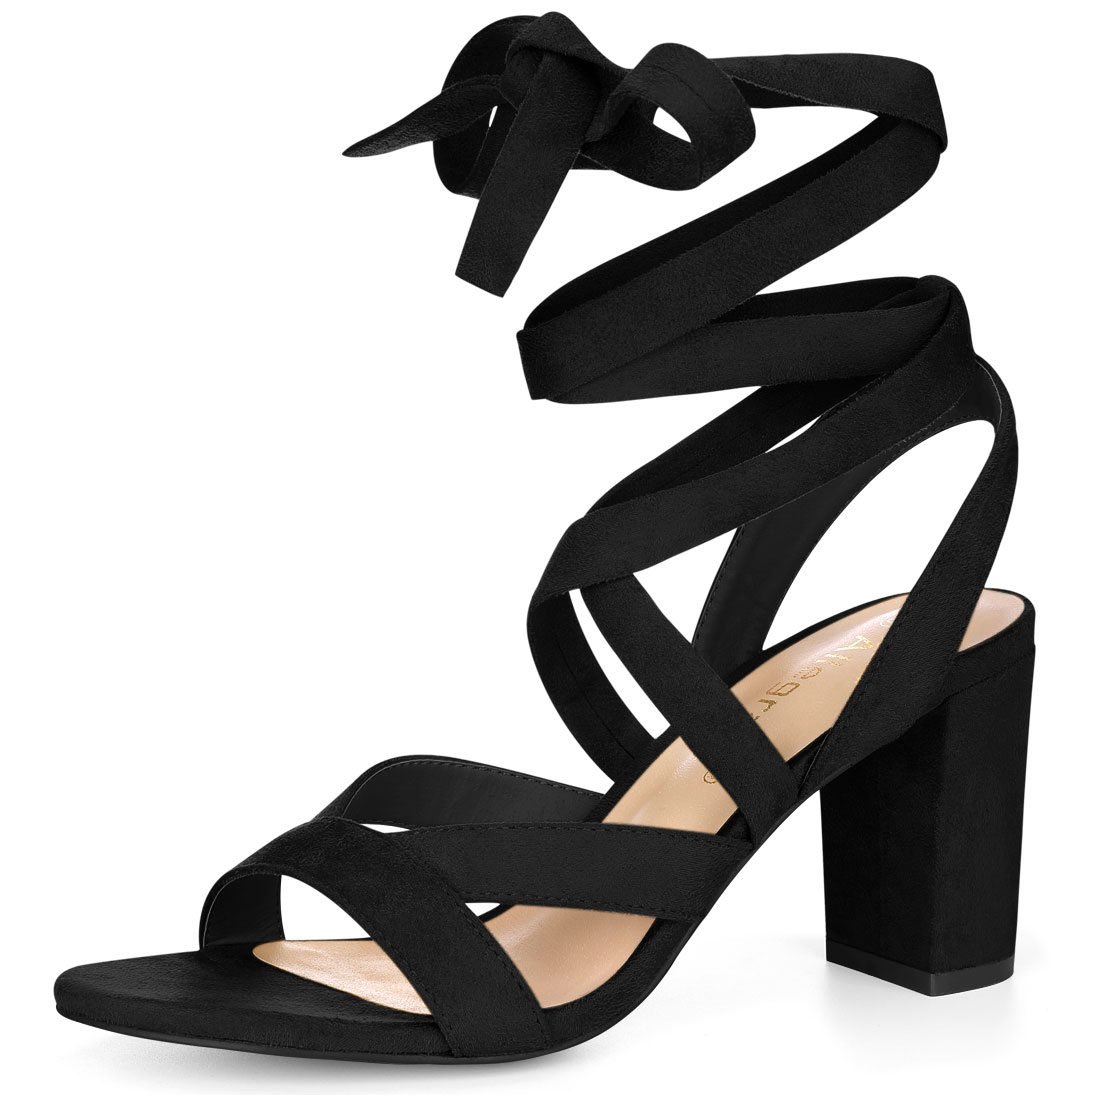 Allegra K Women Crisscross Lace Up Chunky Heel Sandals Black US 10